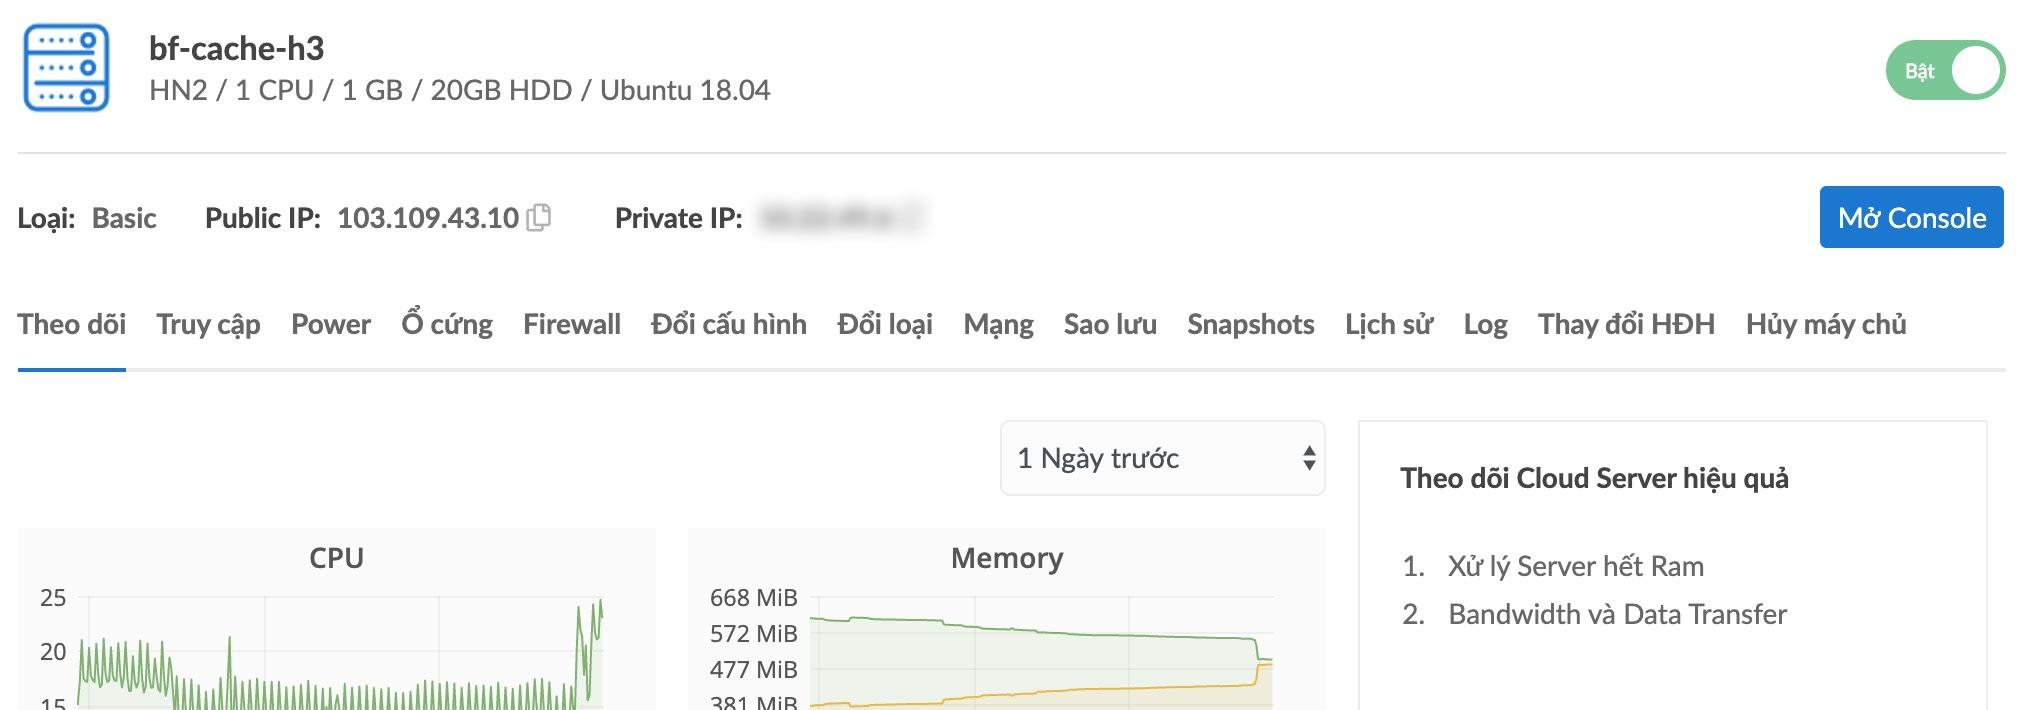 bizfly cau hinh server